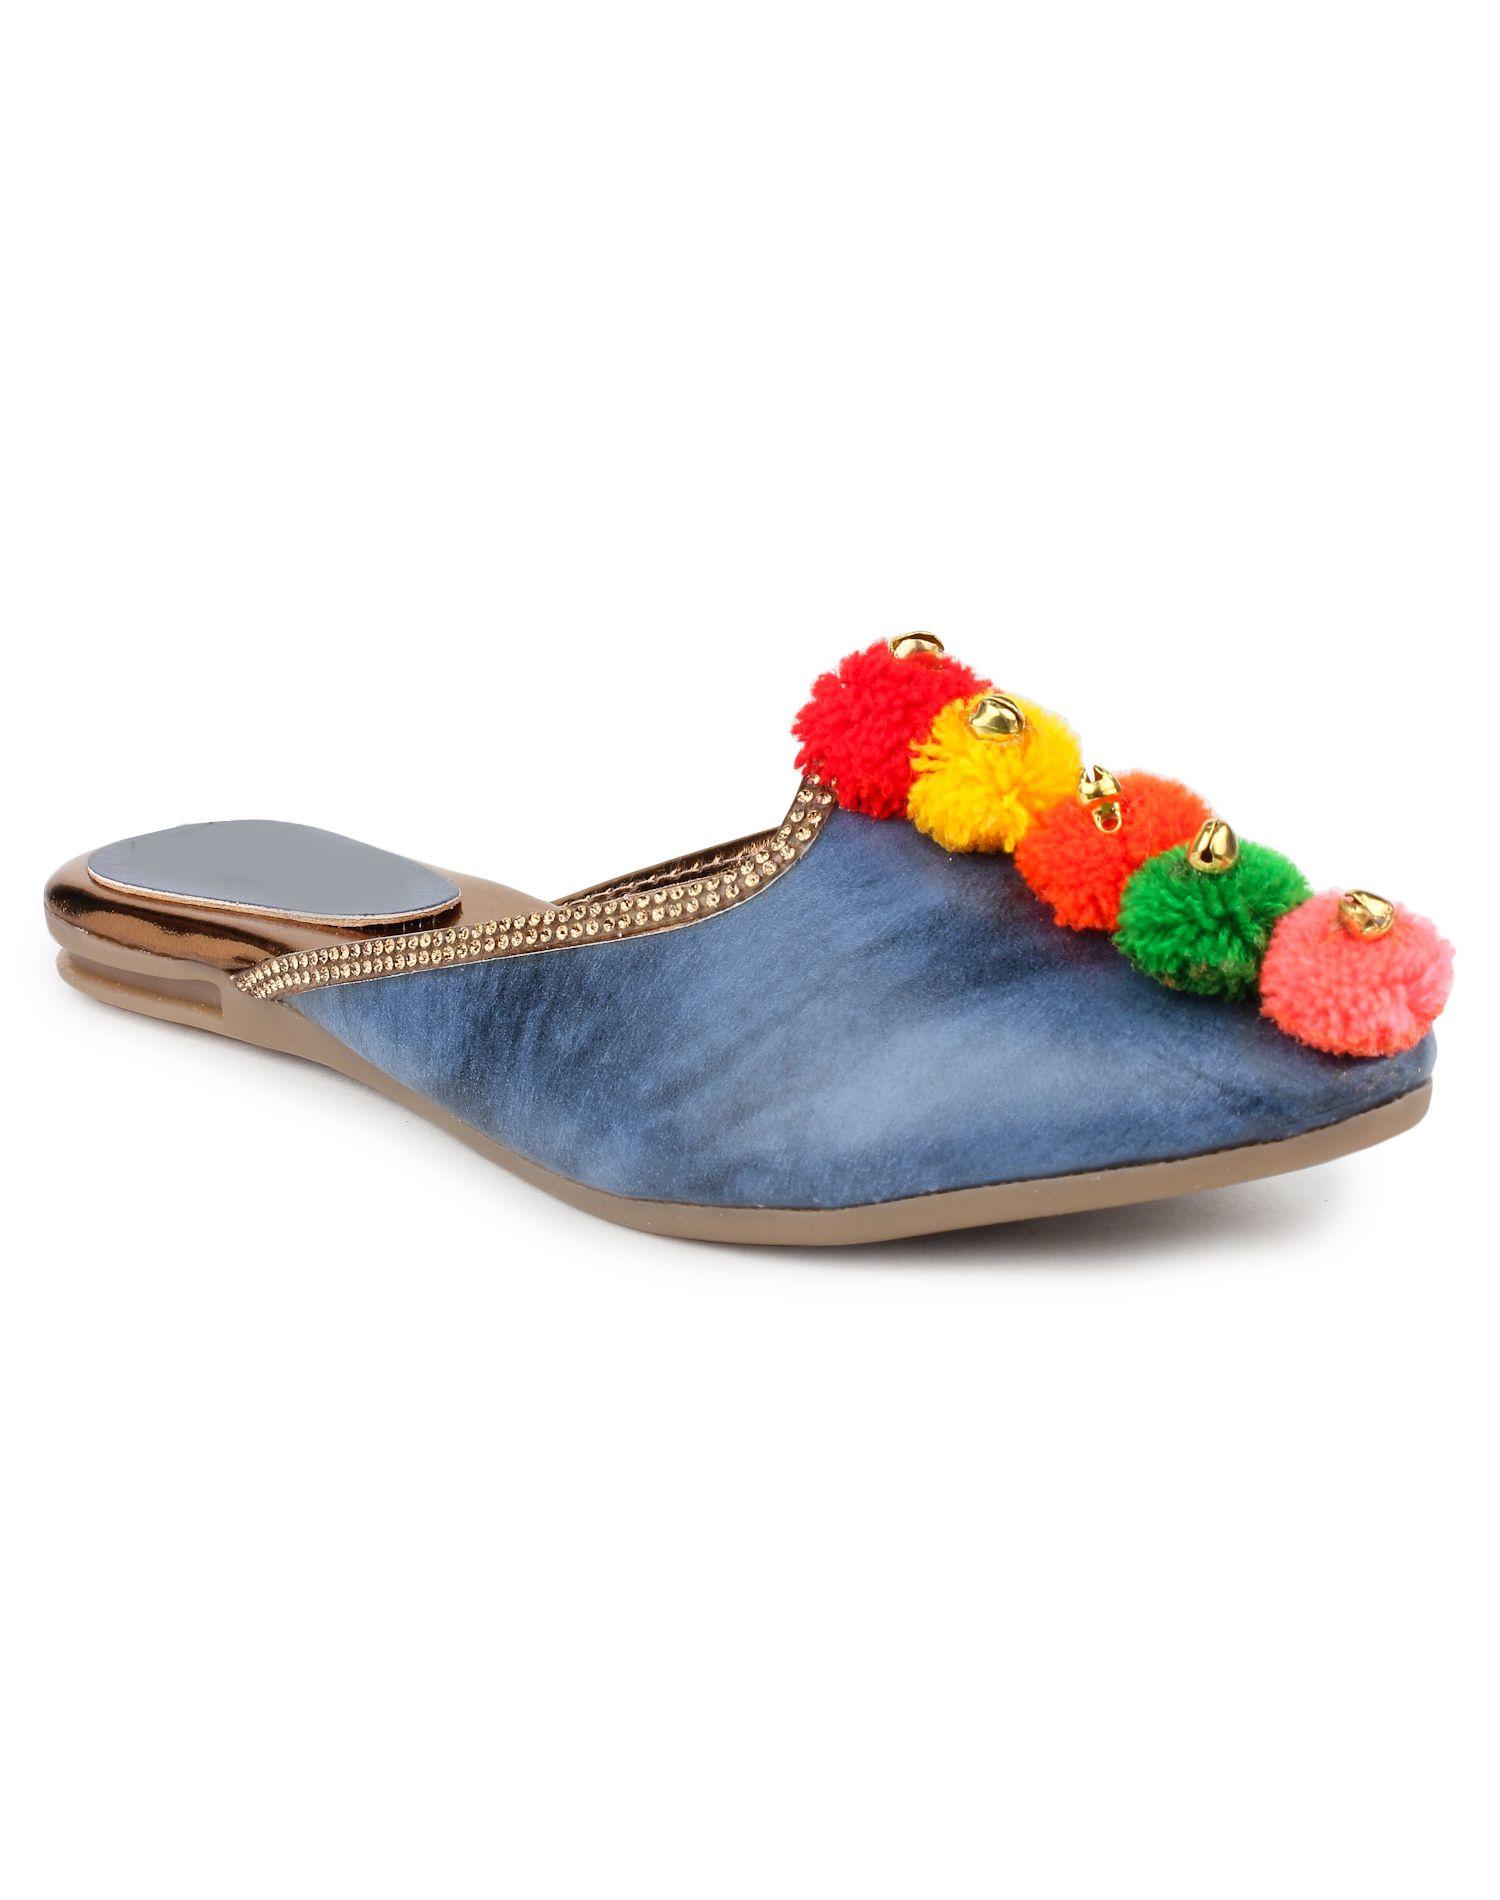 862ab8bce Do Bhai Blue Flat Flats Price in India- Buy Do Bhai Blue Flat Flats Online  at Snapdeal